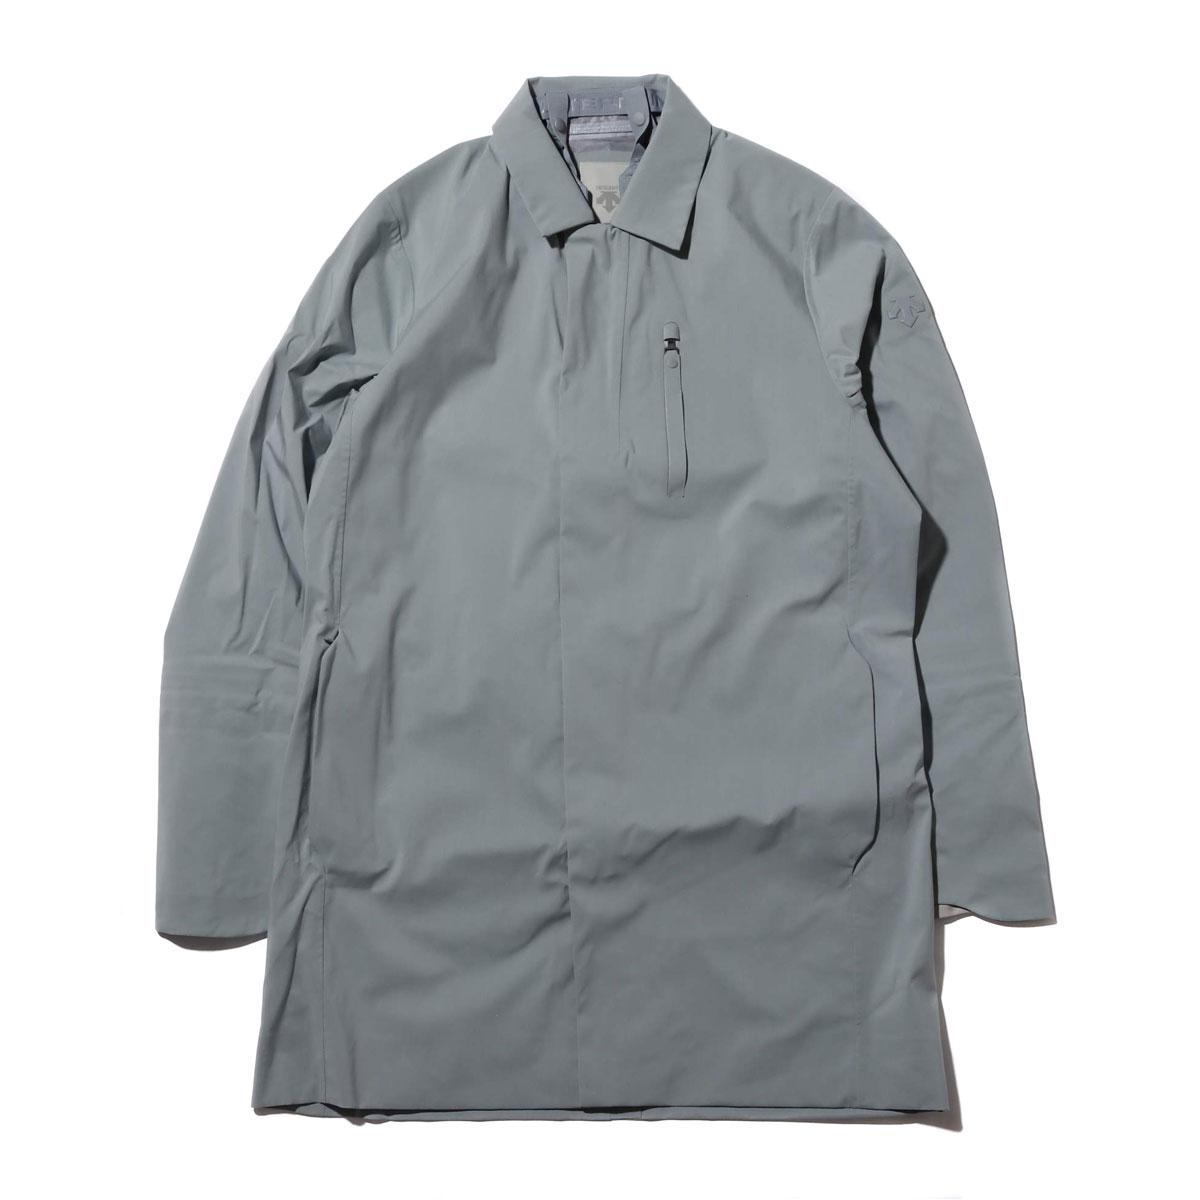 DESCENTE ALLTERRAIN HARD SHELL BAL COLLAR COAT(FOG GRAY)(デサント オルテライン ハード シェル ステンカラー コート)【メンズ】【コート】【18FA-I】